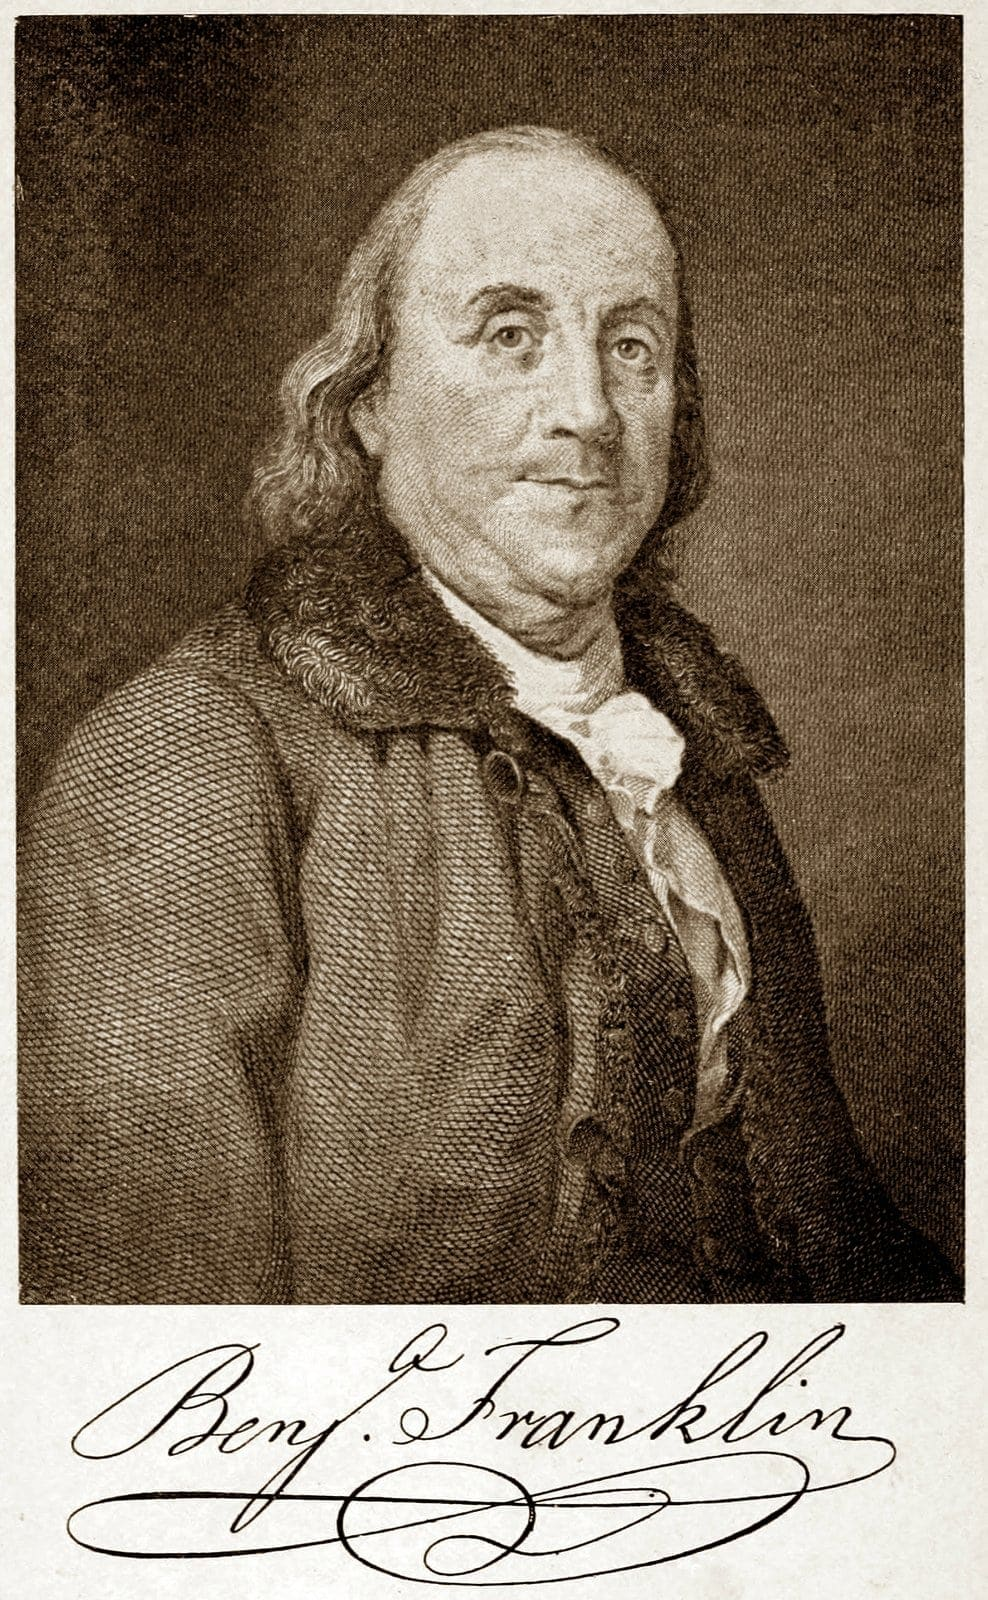 Benjamin Franklin portrait and signature